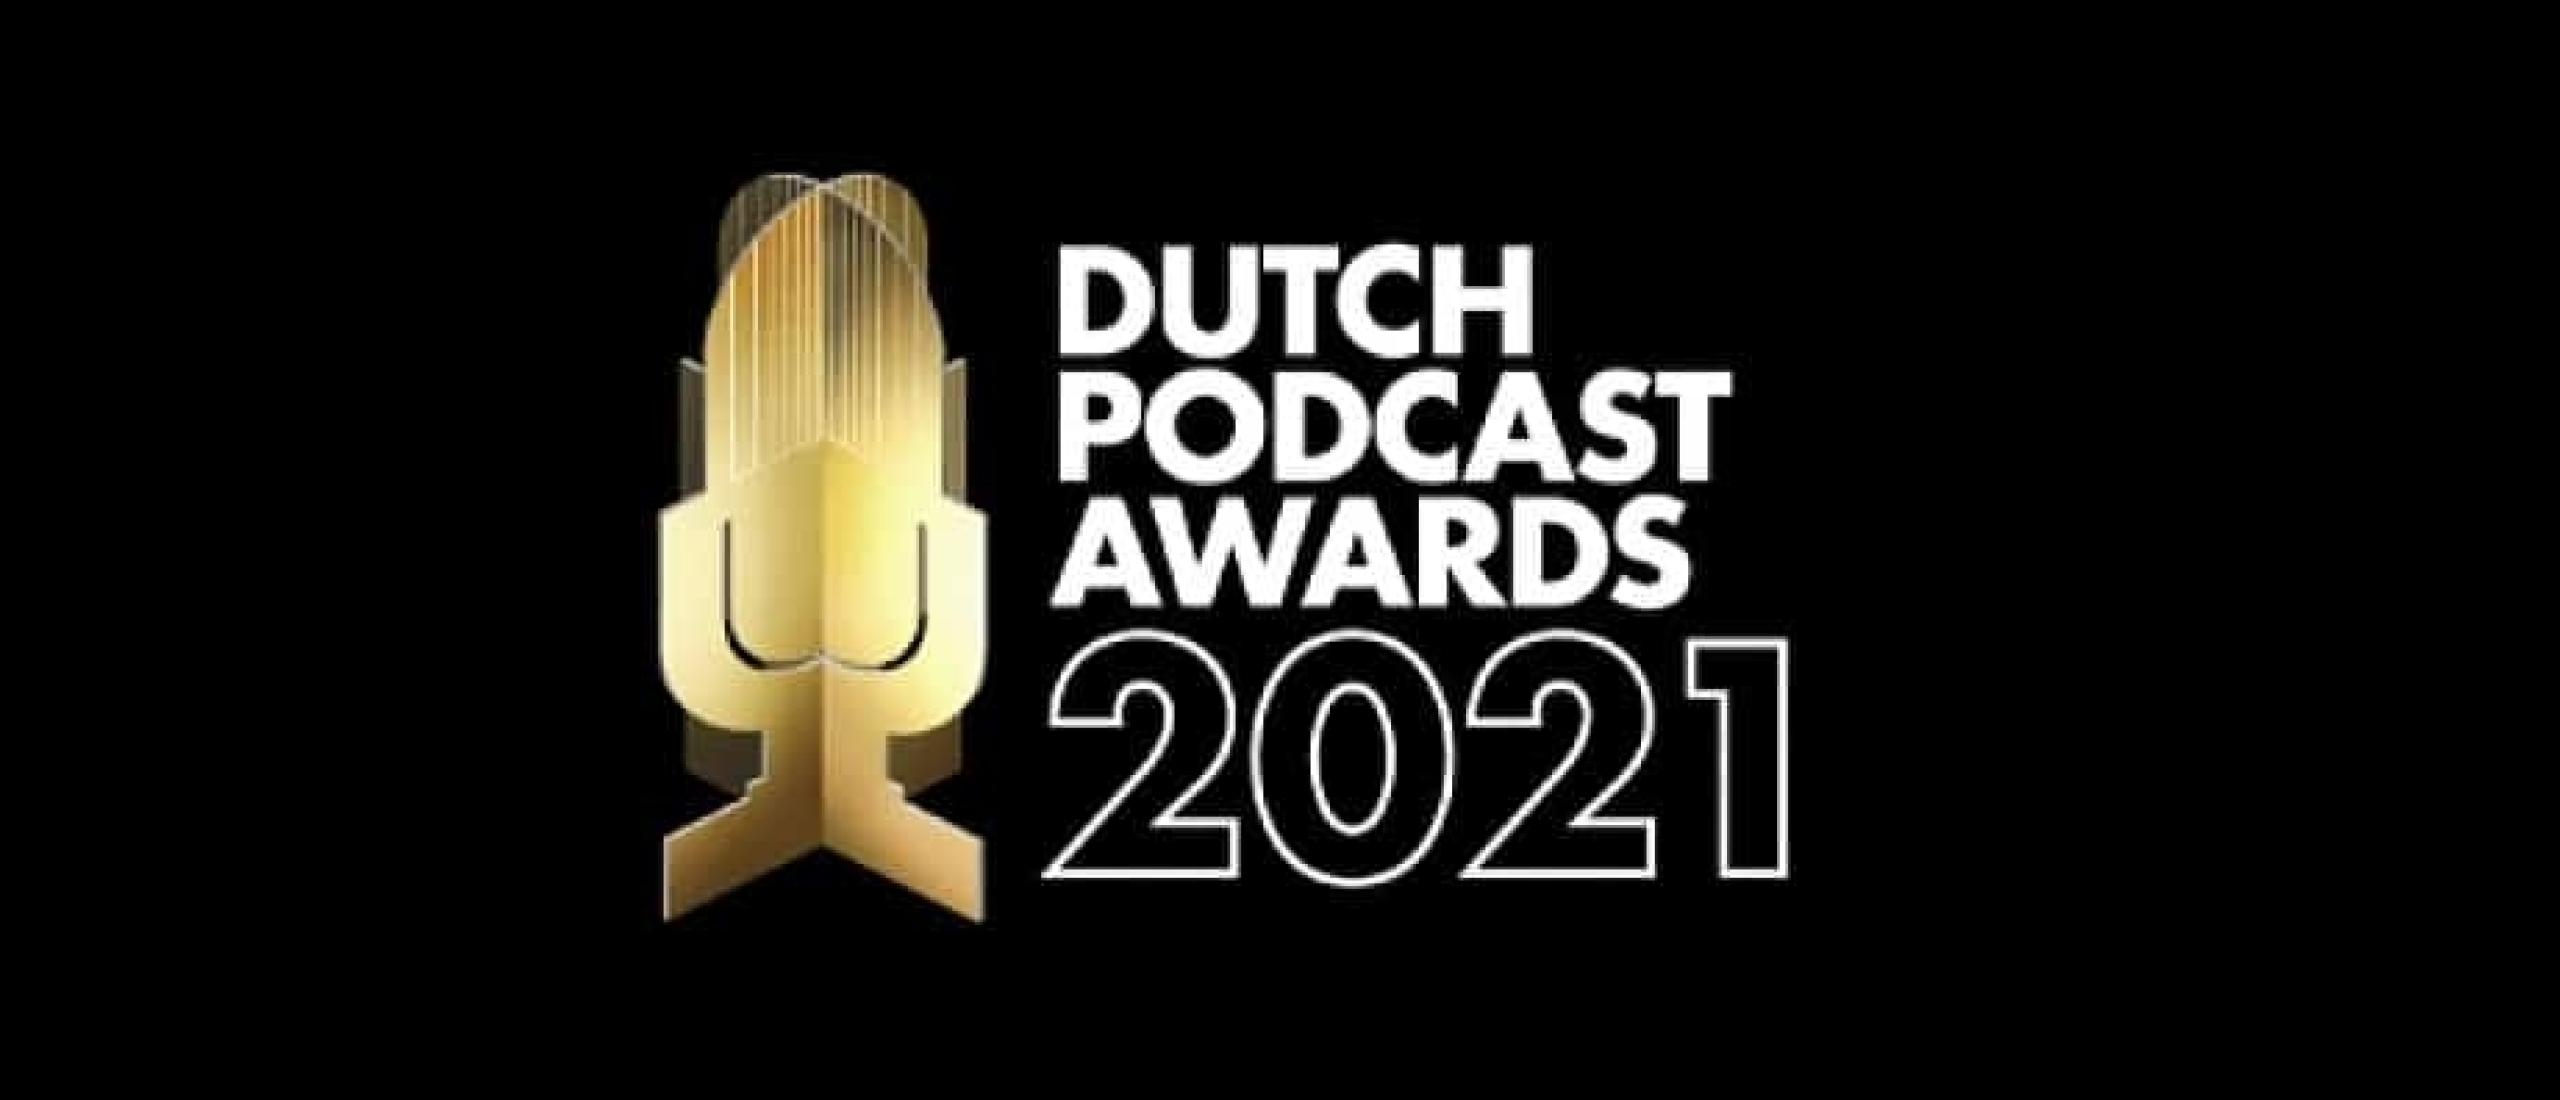 Stem jij op onze podcast? Dutch Podcast Awards 2021